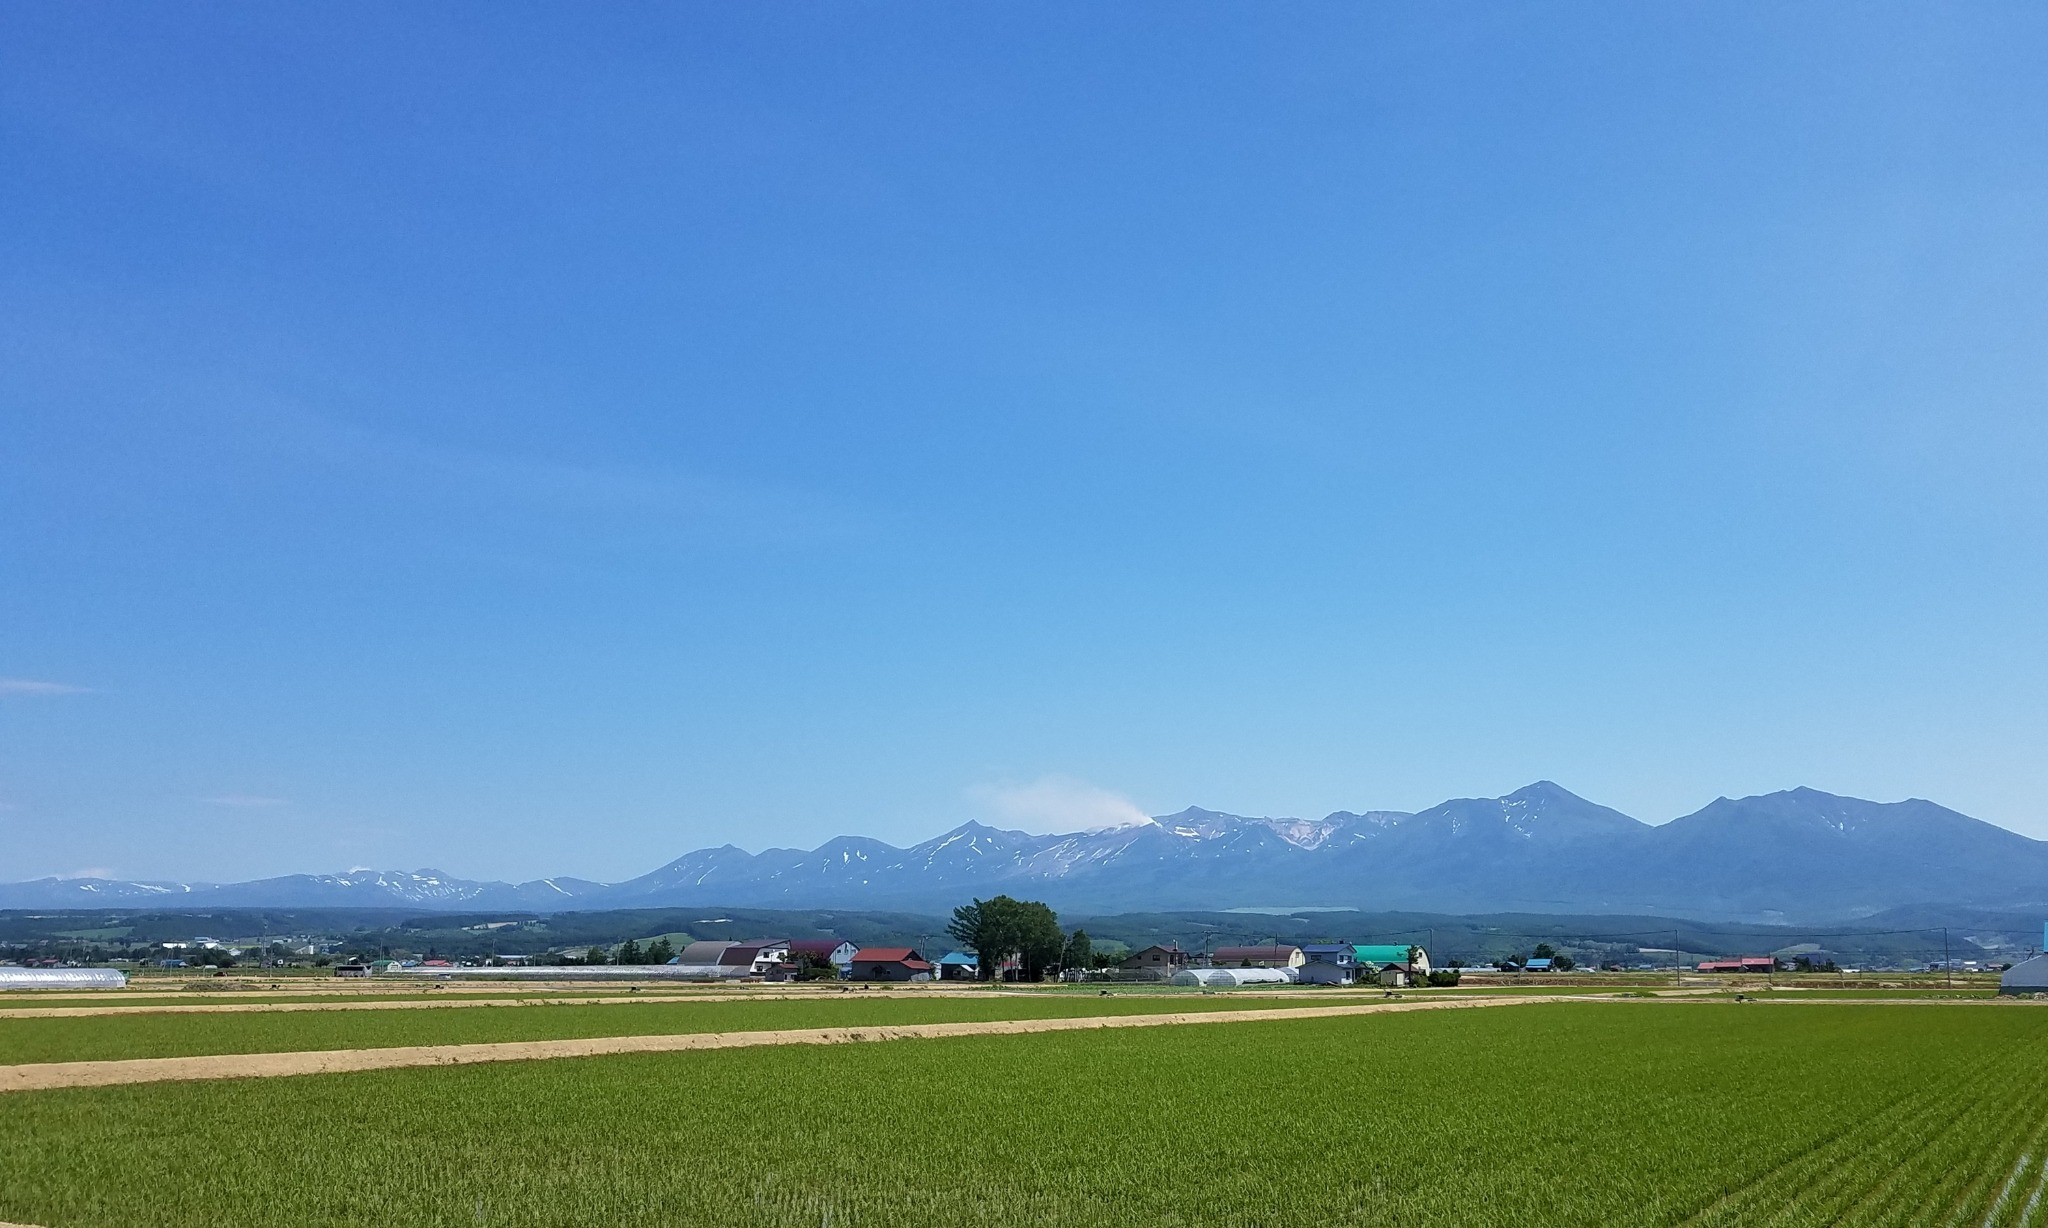 前の景色(夏)